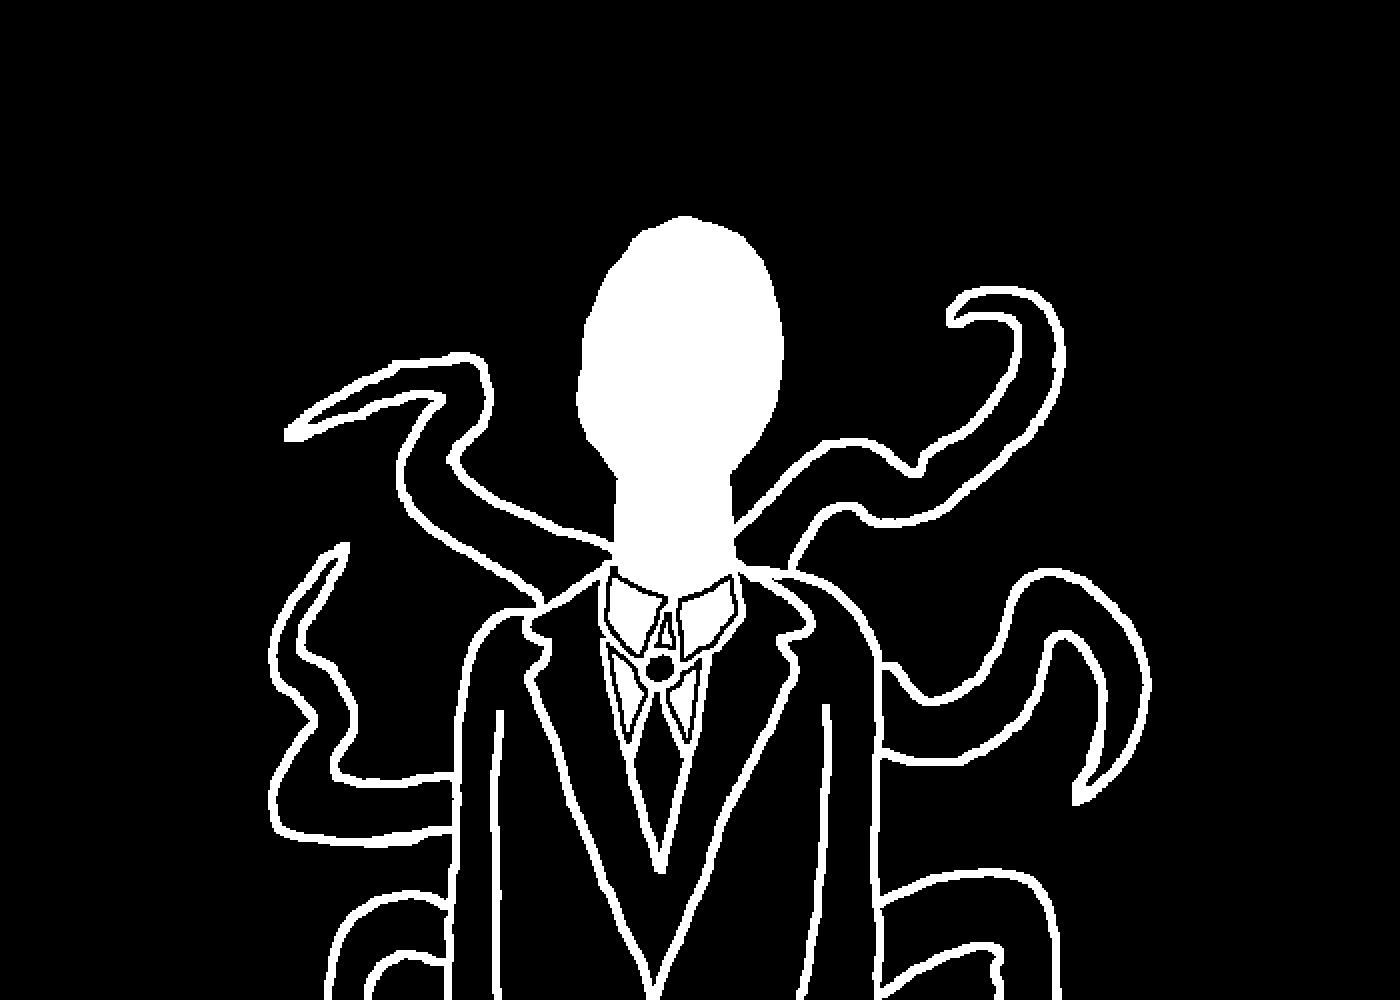 Slendy Man